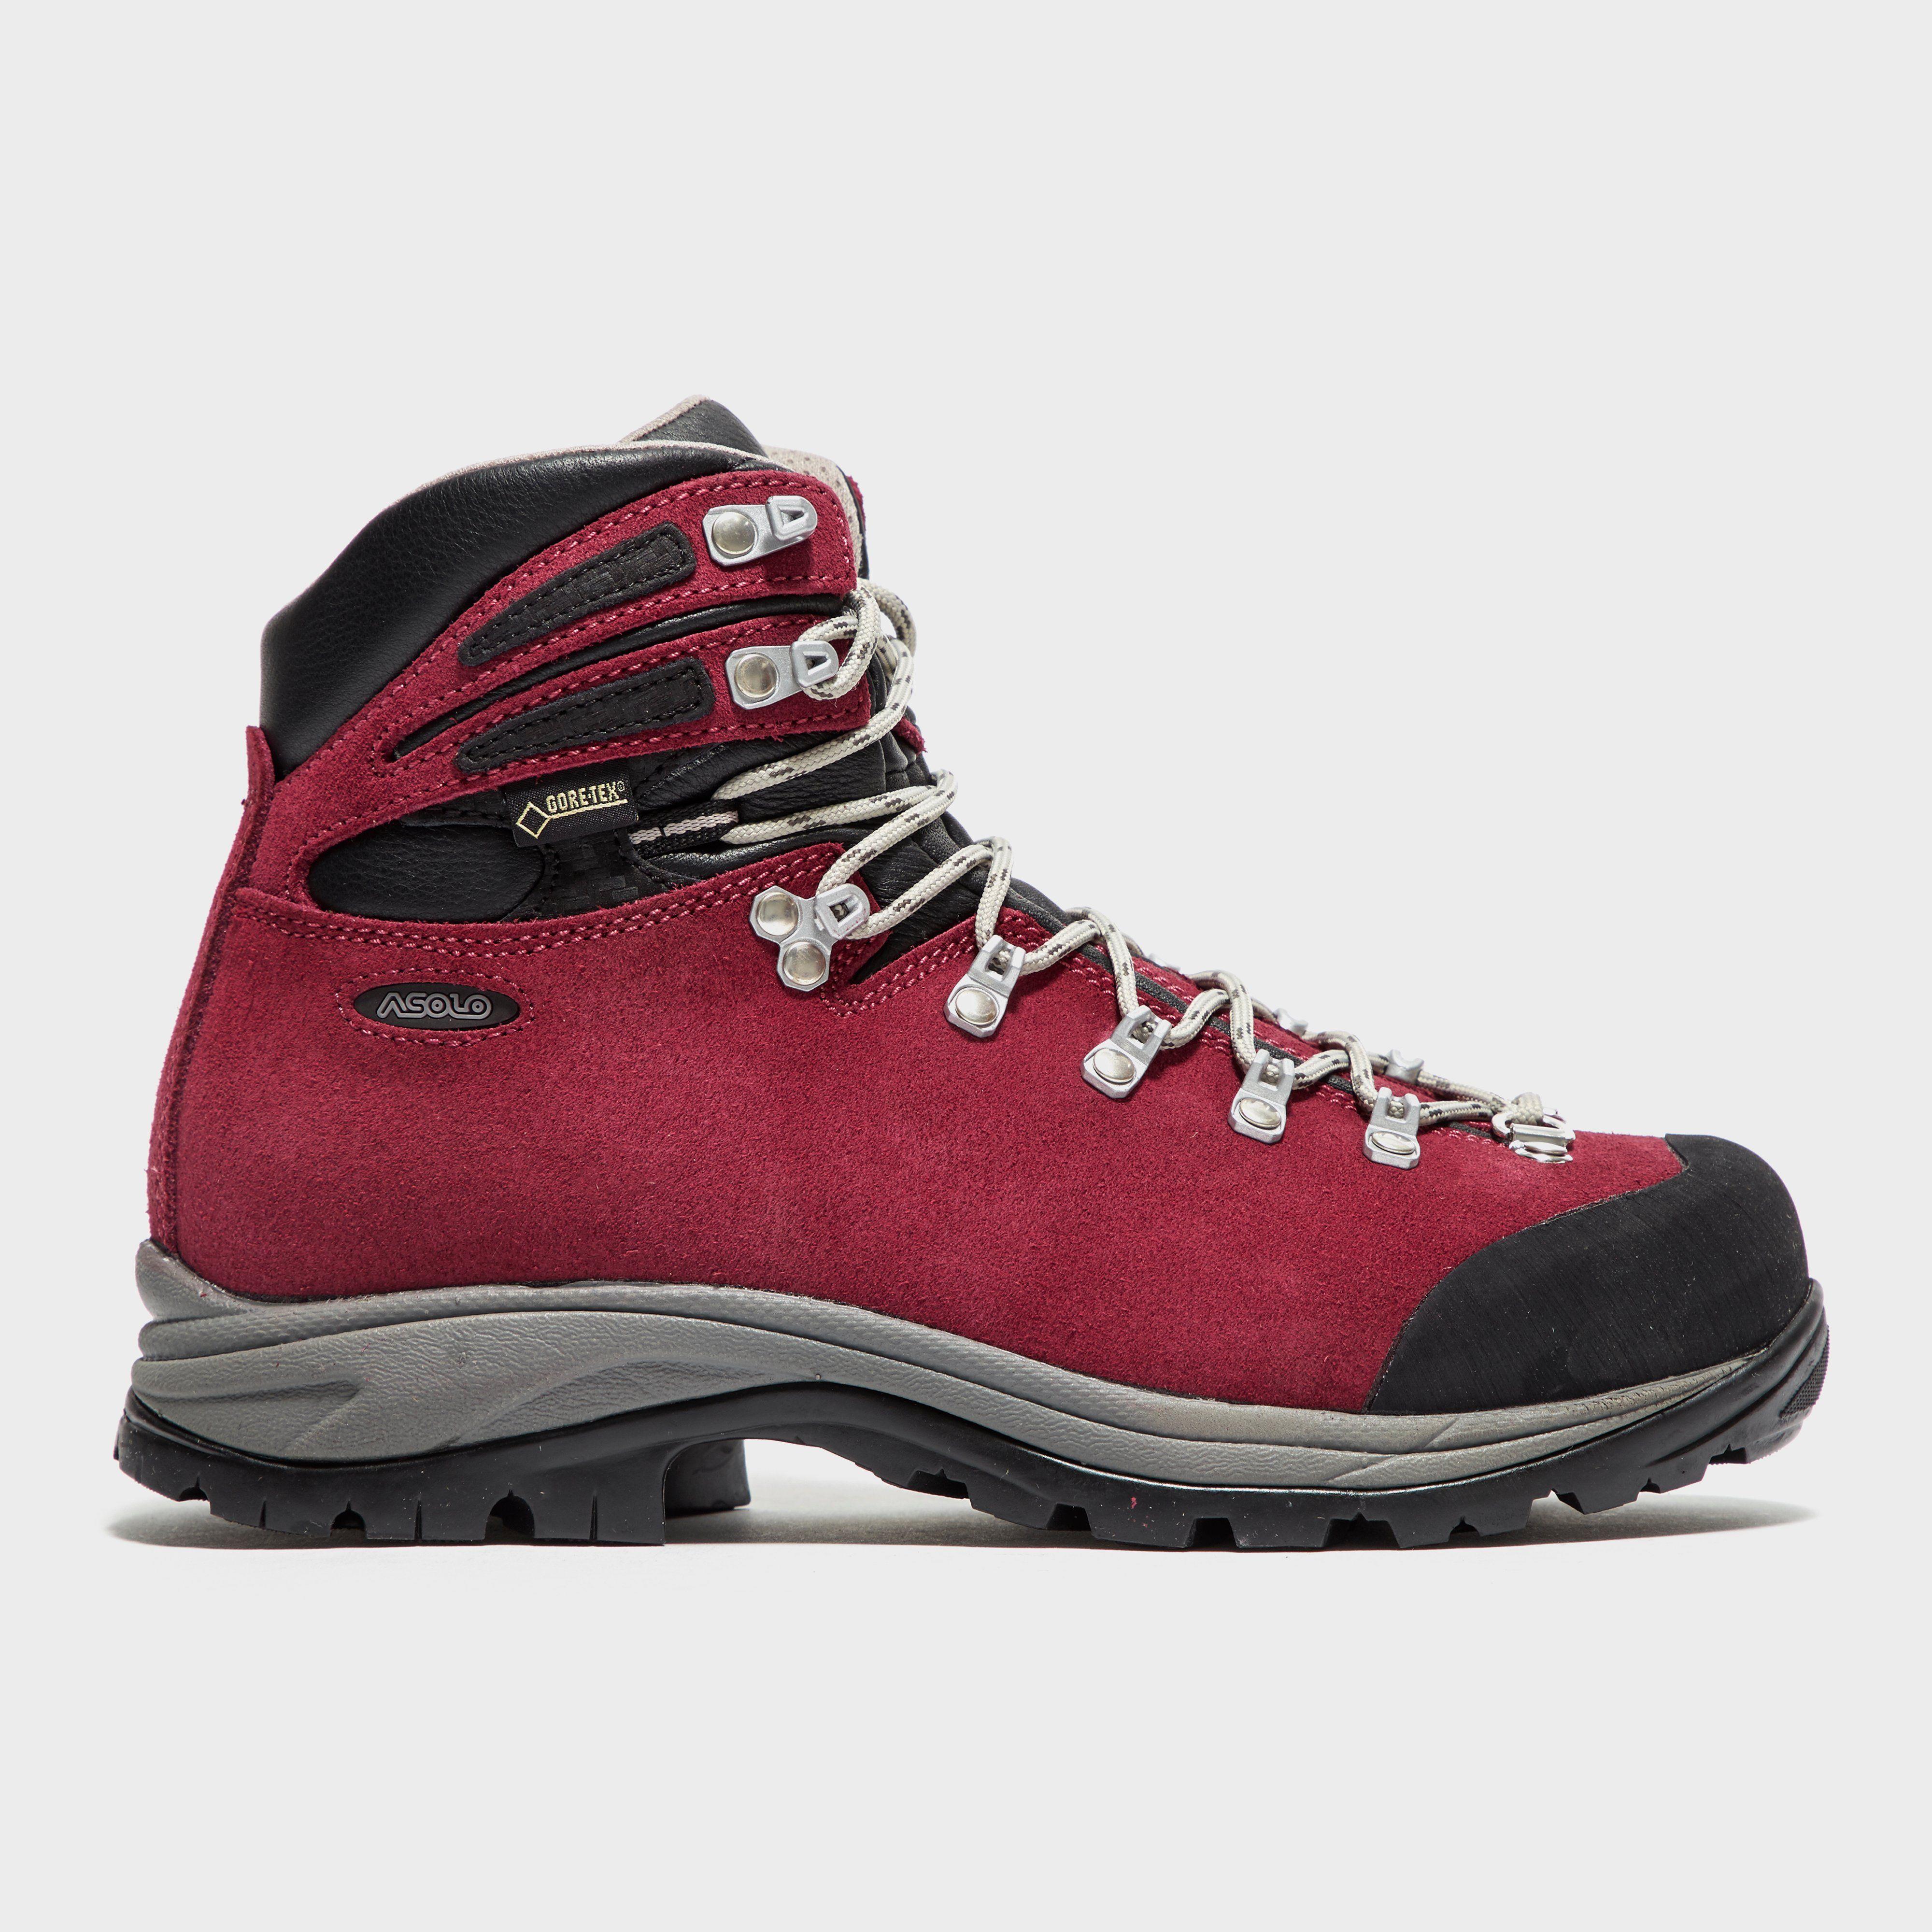 ASOLO Tribe Gore-Tex® GV ML Mountaineering Boot